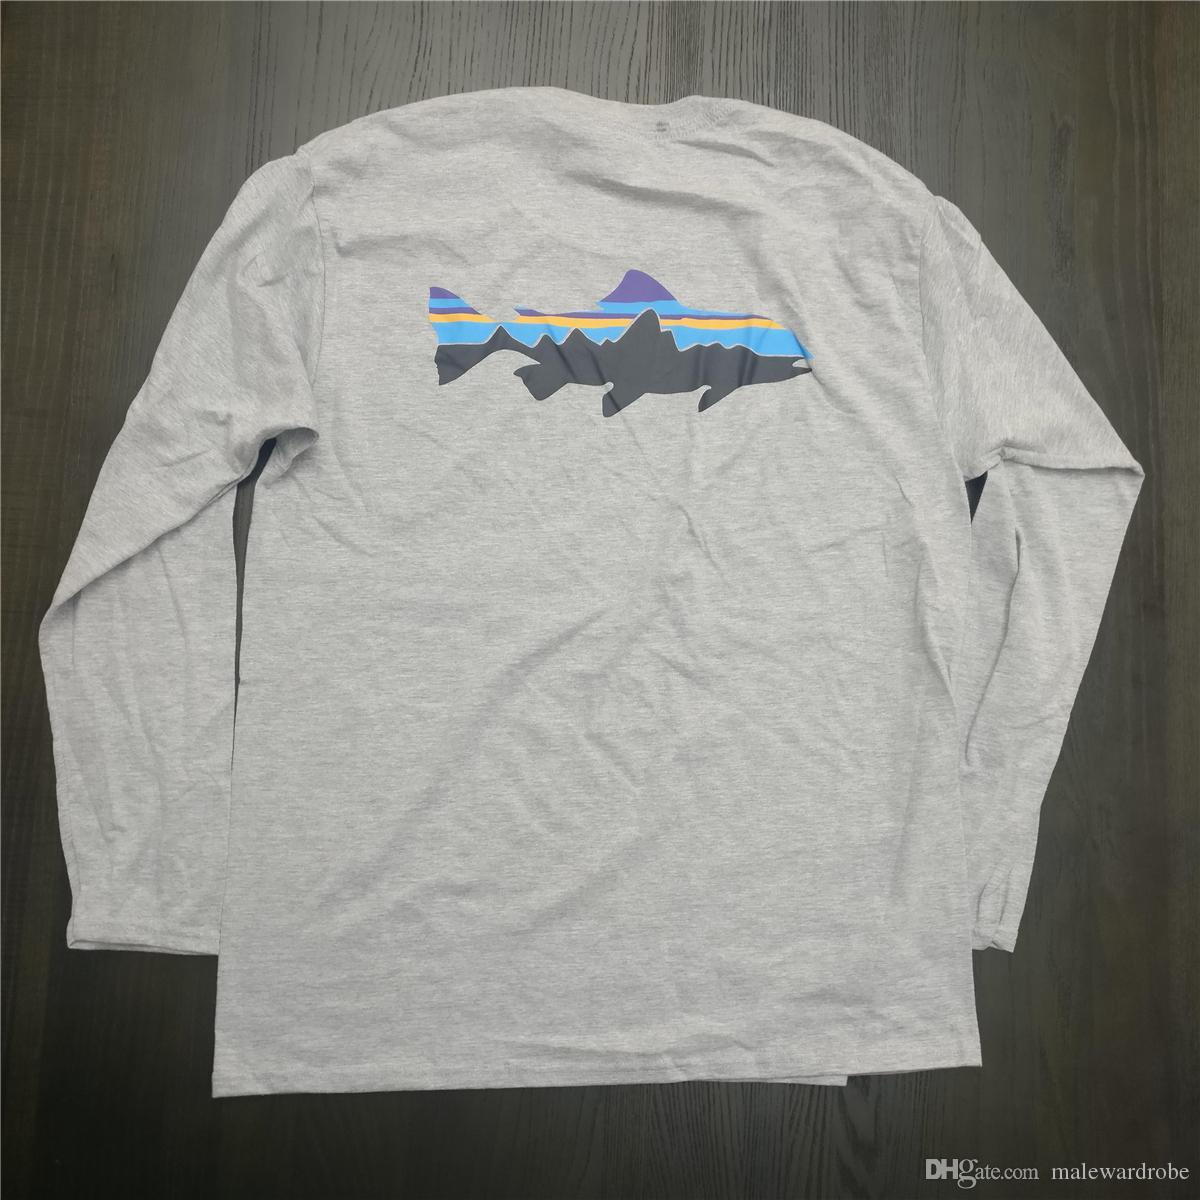 Hombre blanco de Montaña Patagonia diseñador camisetas O-cuello camiseta Tops Manga larga Moda Ropa de la marca Tee